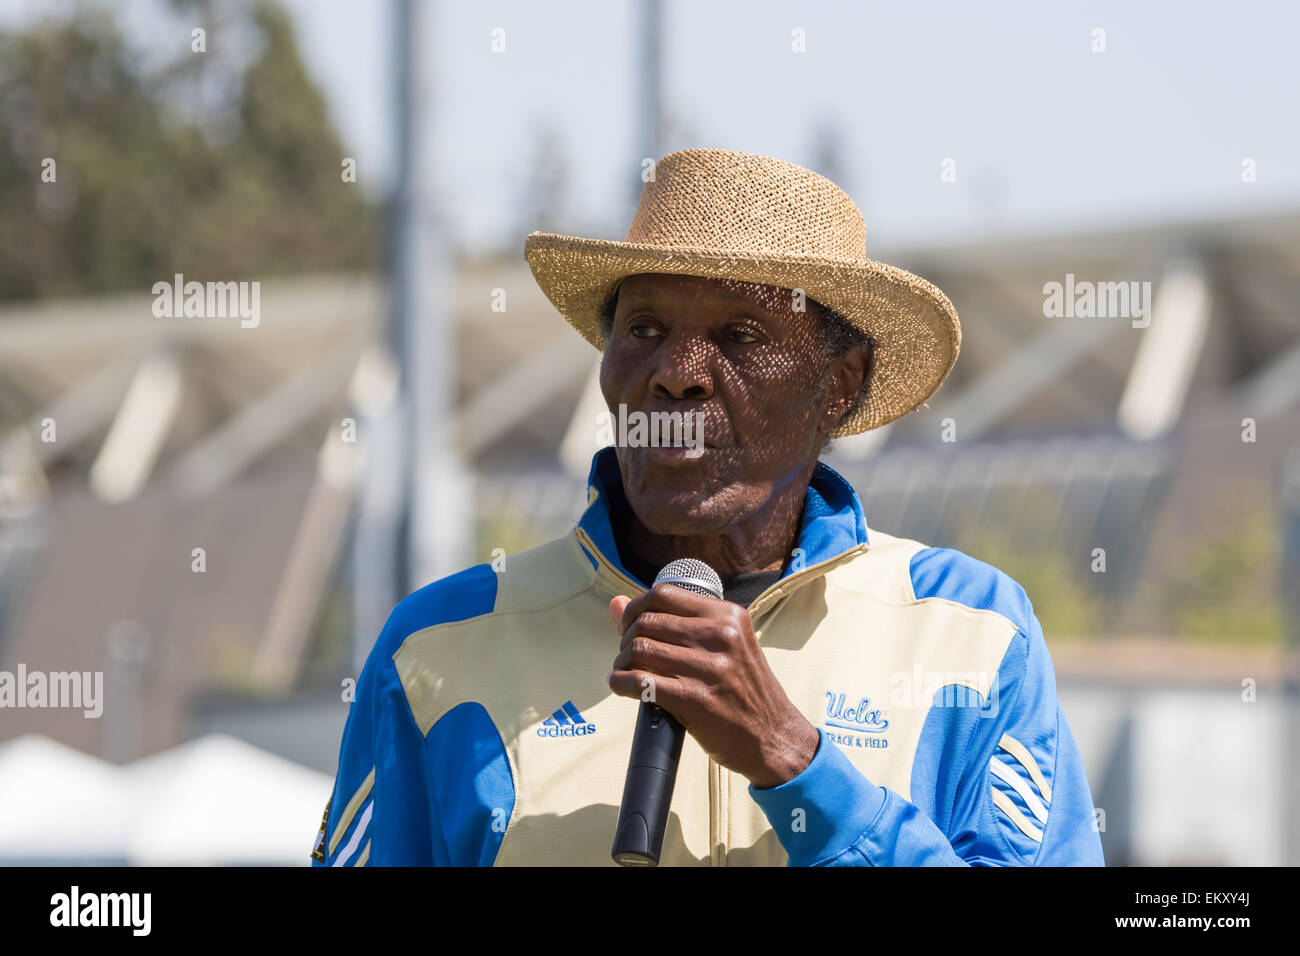 Rafer Lewis Johnson (born August 18, 1935) At the 2015 Rafer Johnson/Jackie Joyner-Kersee Invitational Drake Stadium - Stock Image